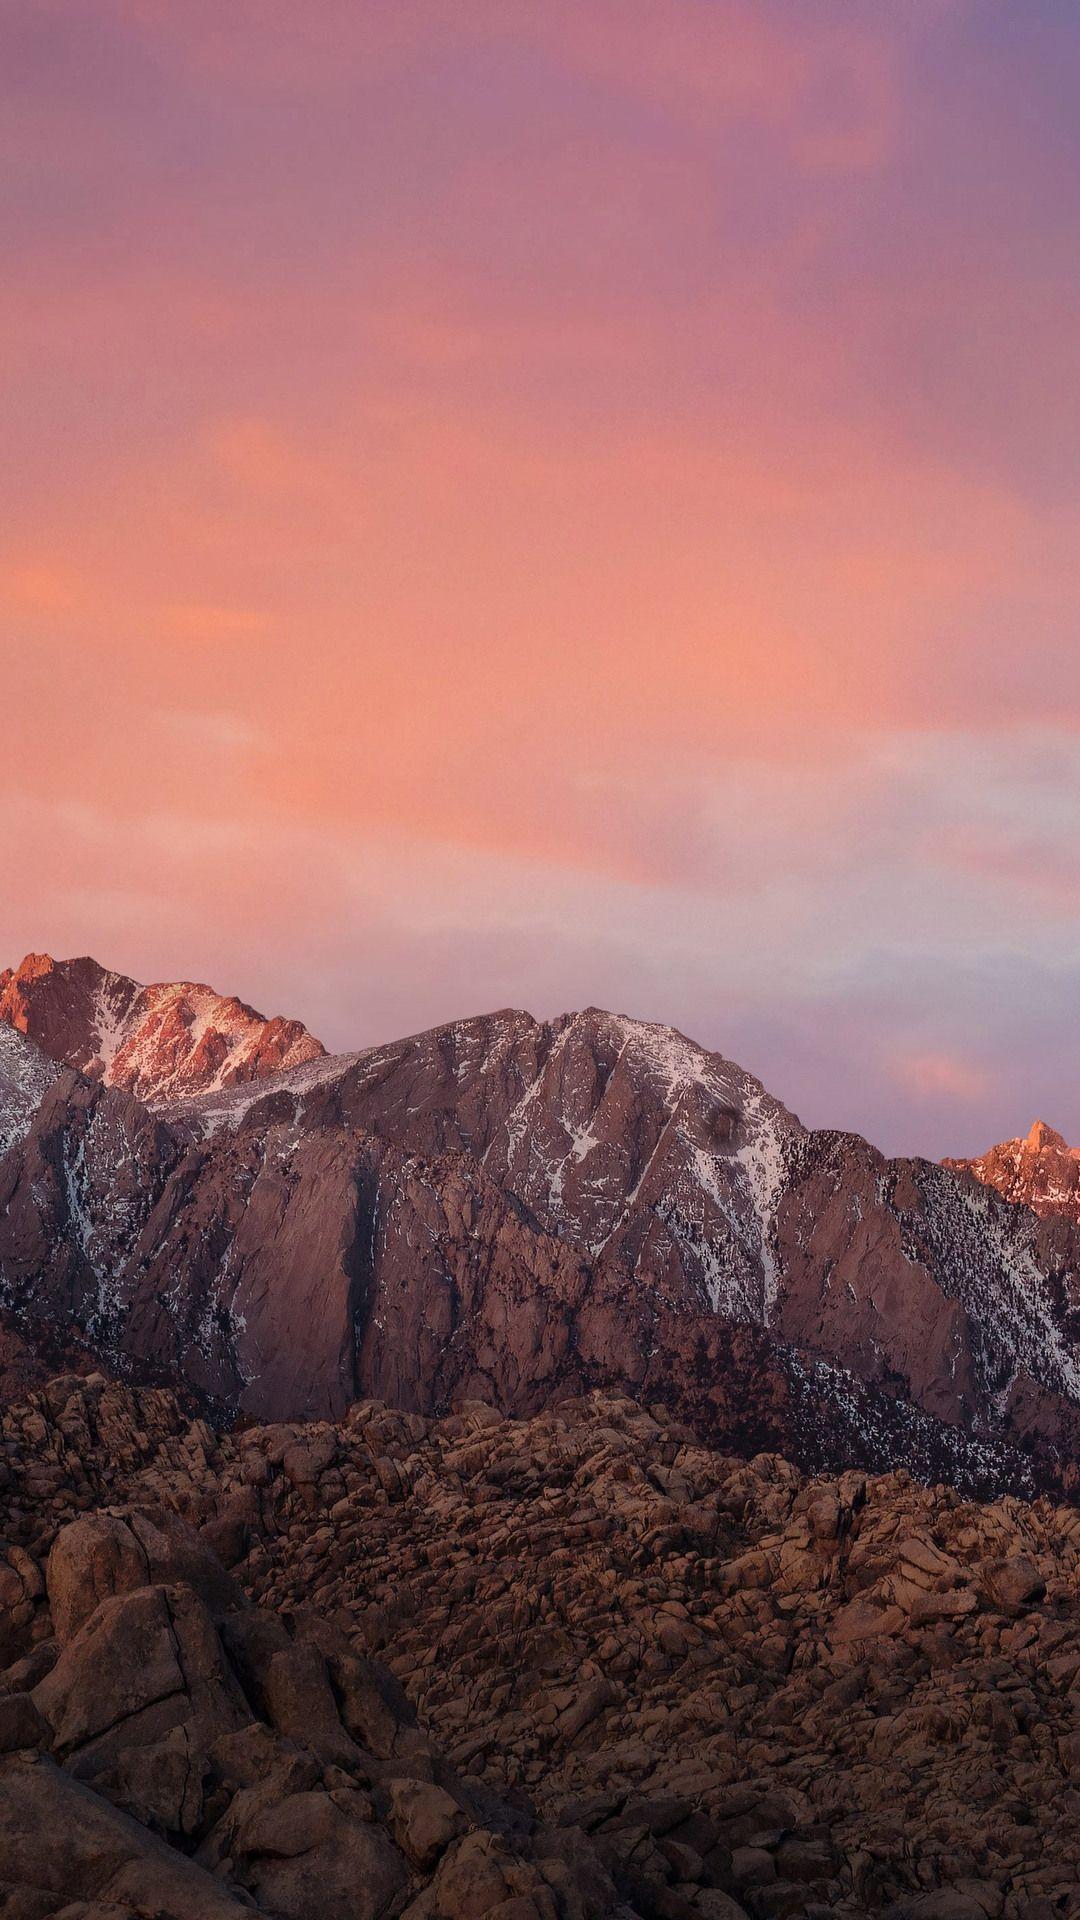 Mac Osx Sierra Wallpapers | hdqwalls.com